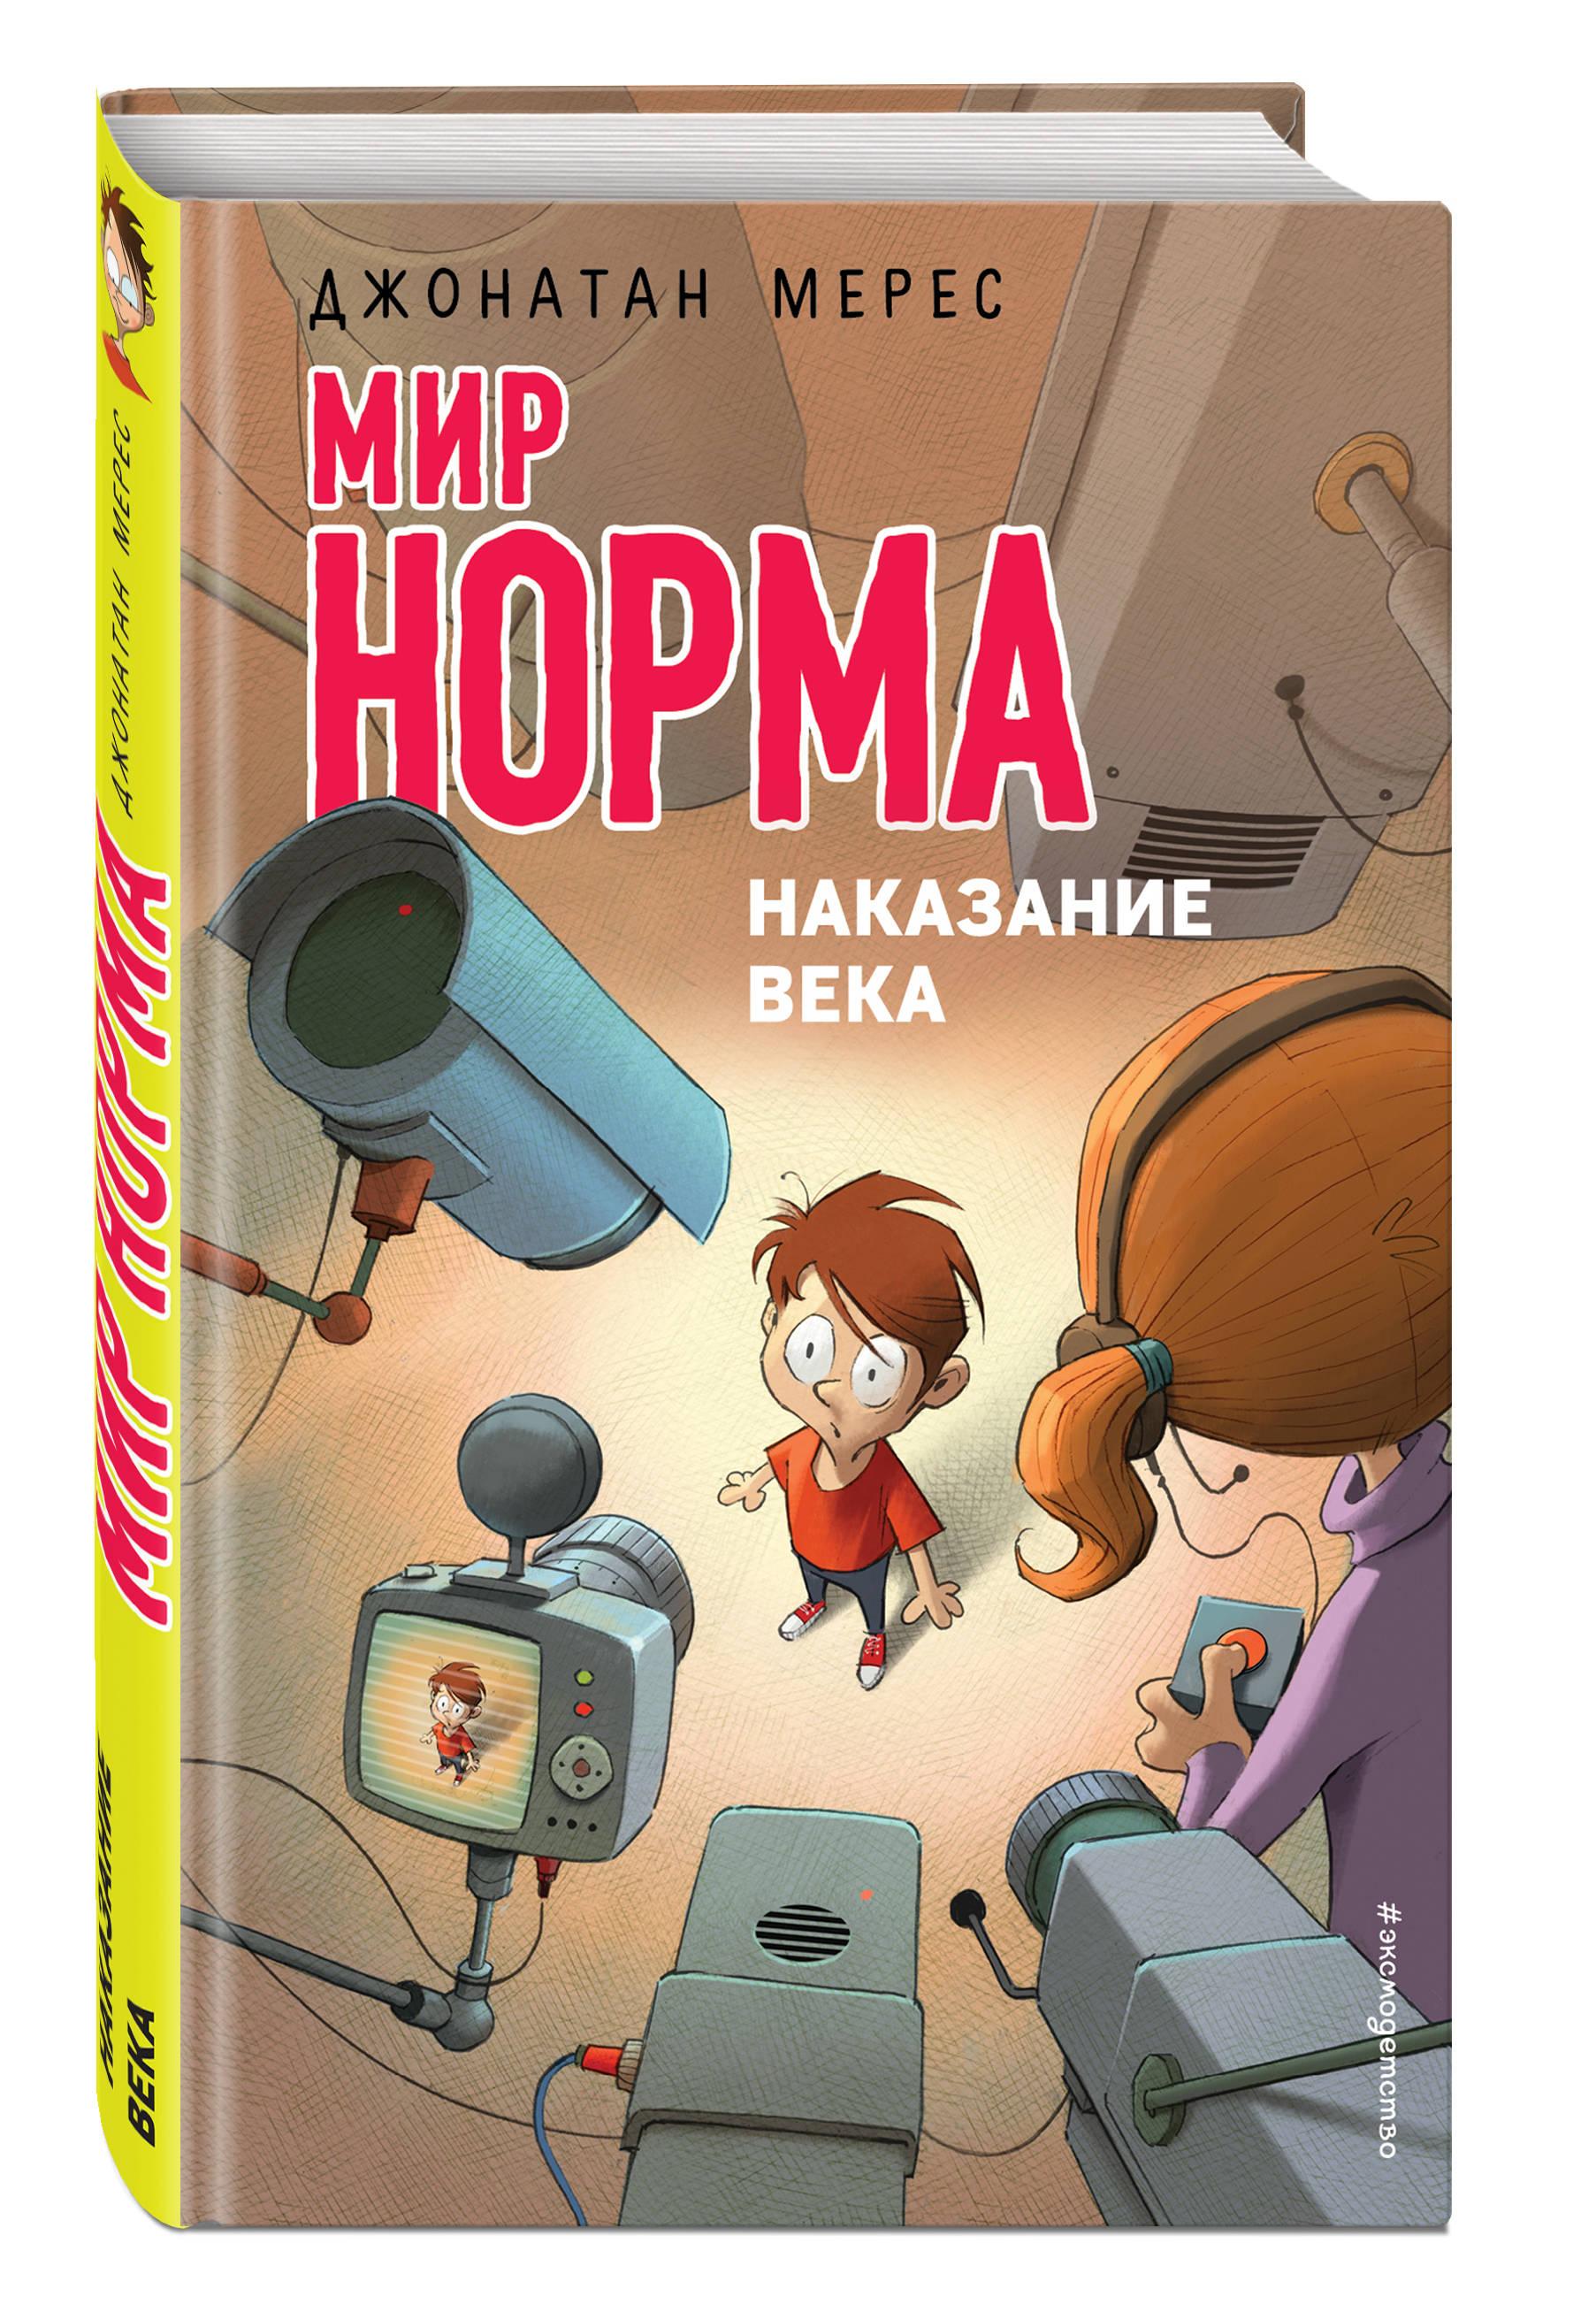 Мерес Д. Наказание века ISBN: 978-5-04-091833-1